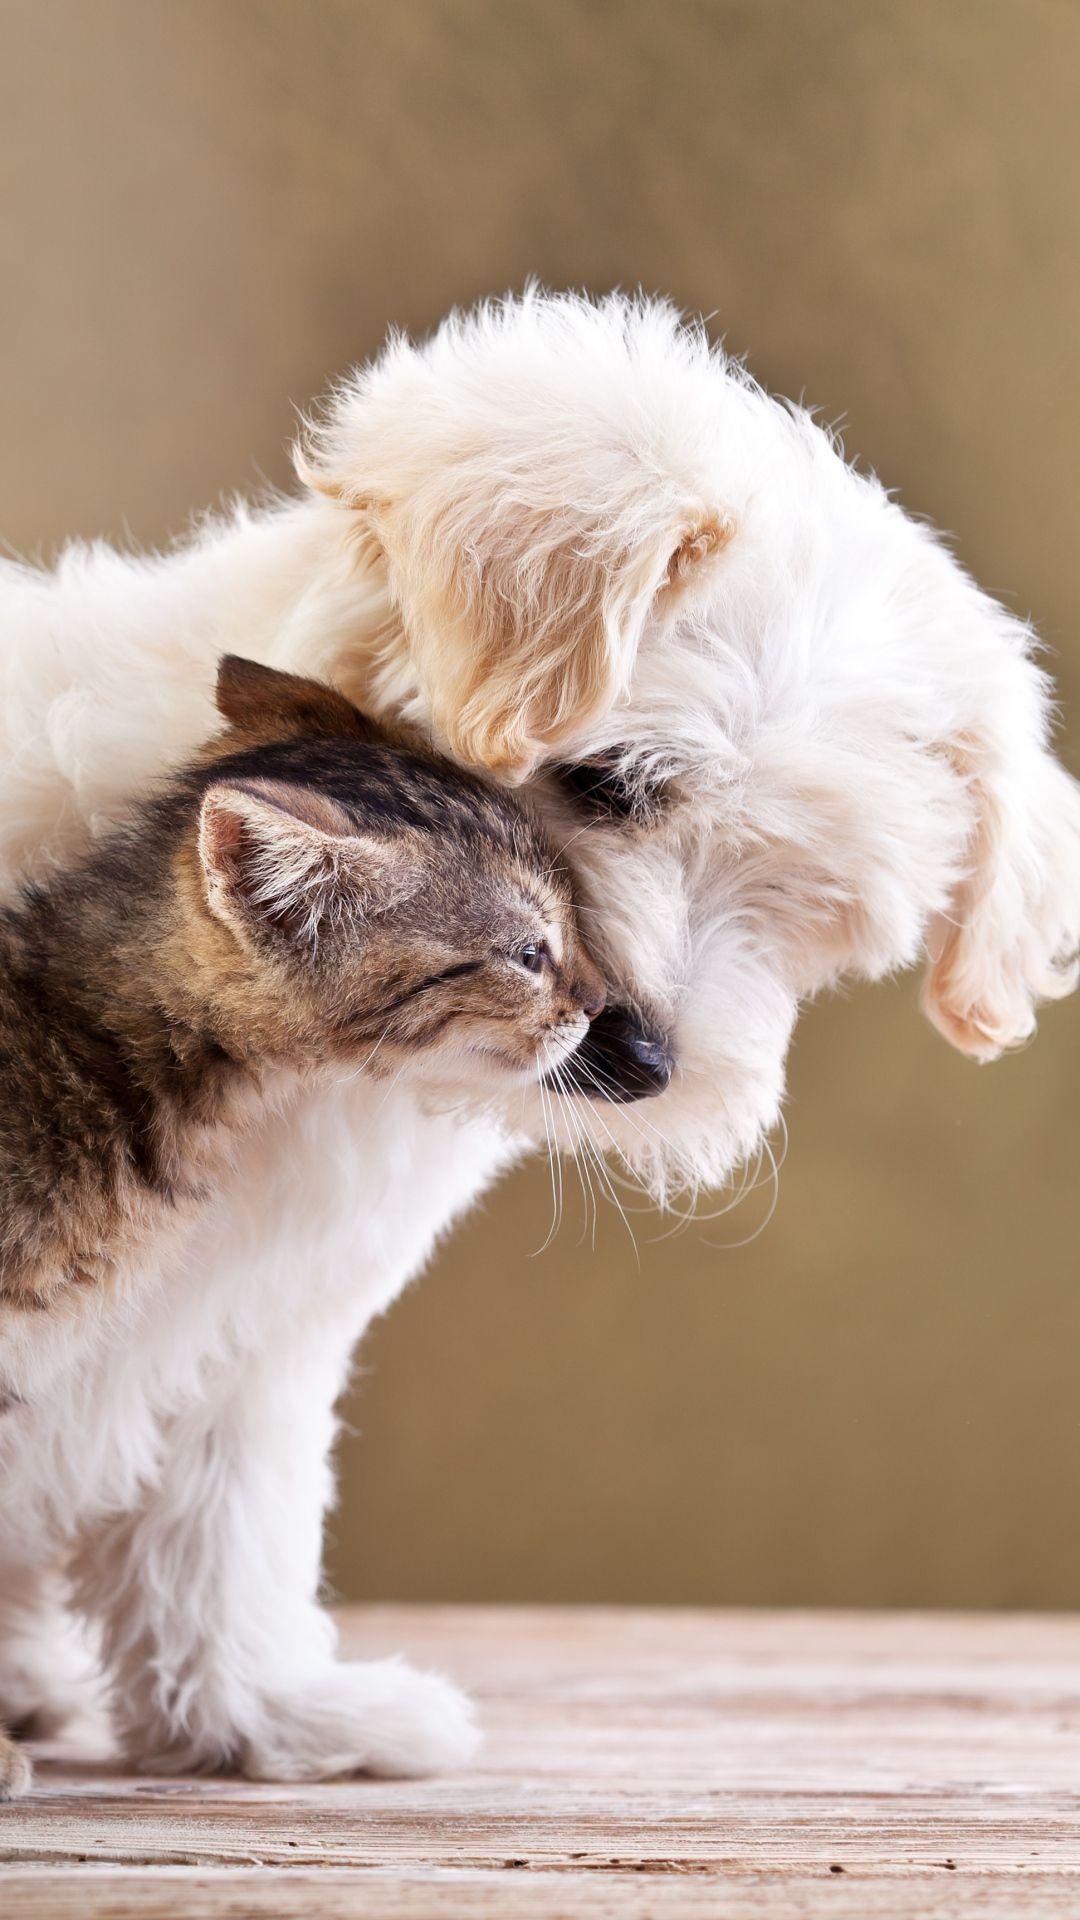 Puppy Kitten Friends Animals Caring Tenderness Kittens Cutest Cute Animals Pets